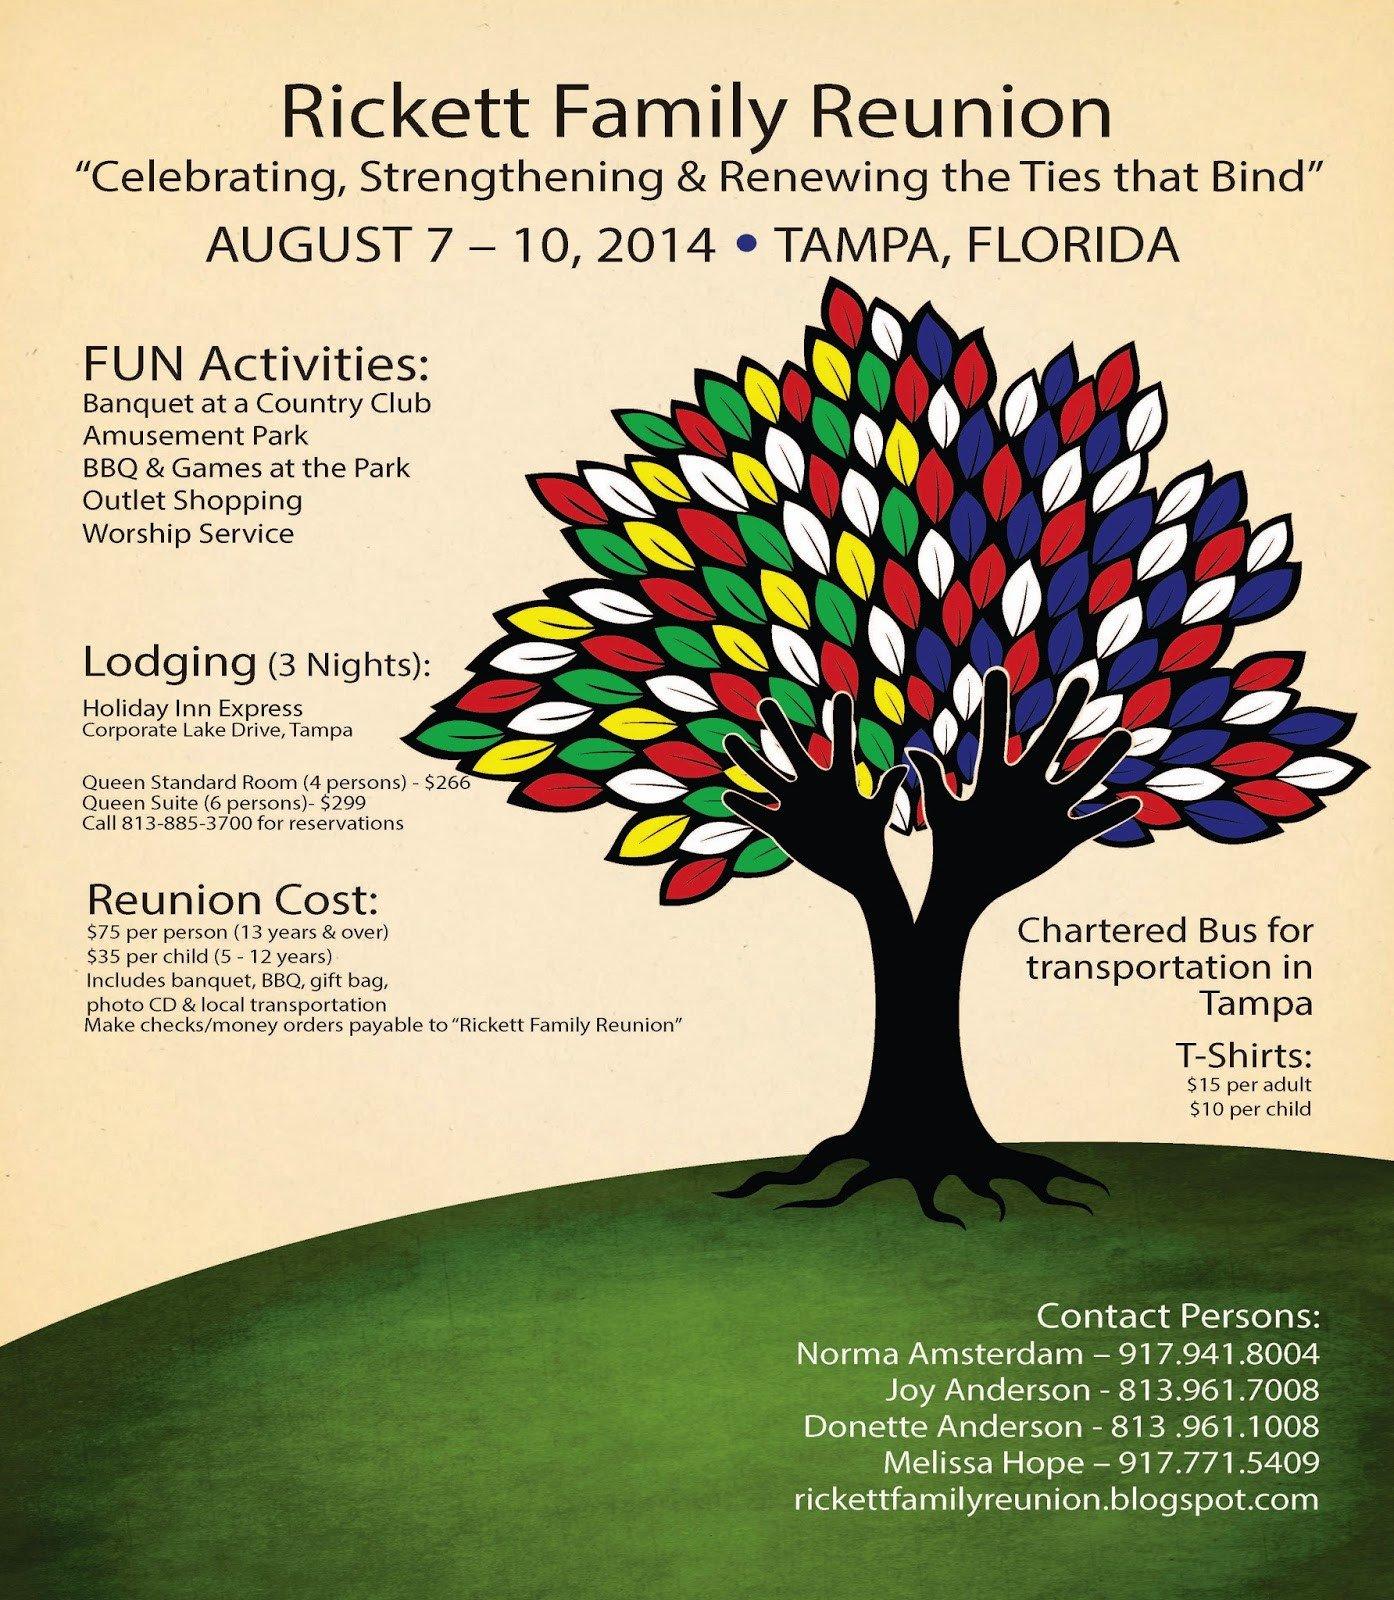 Family Reunion Flyer Templates Rickett Family Reunion Blog